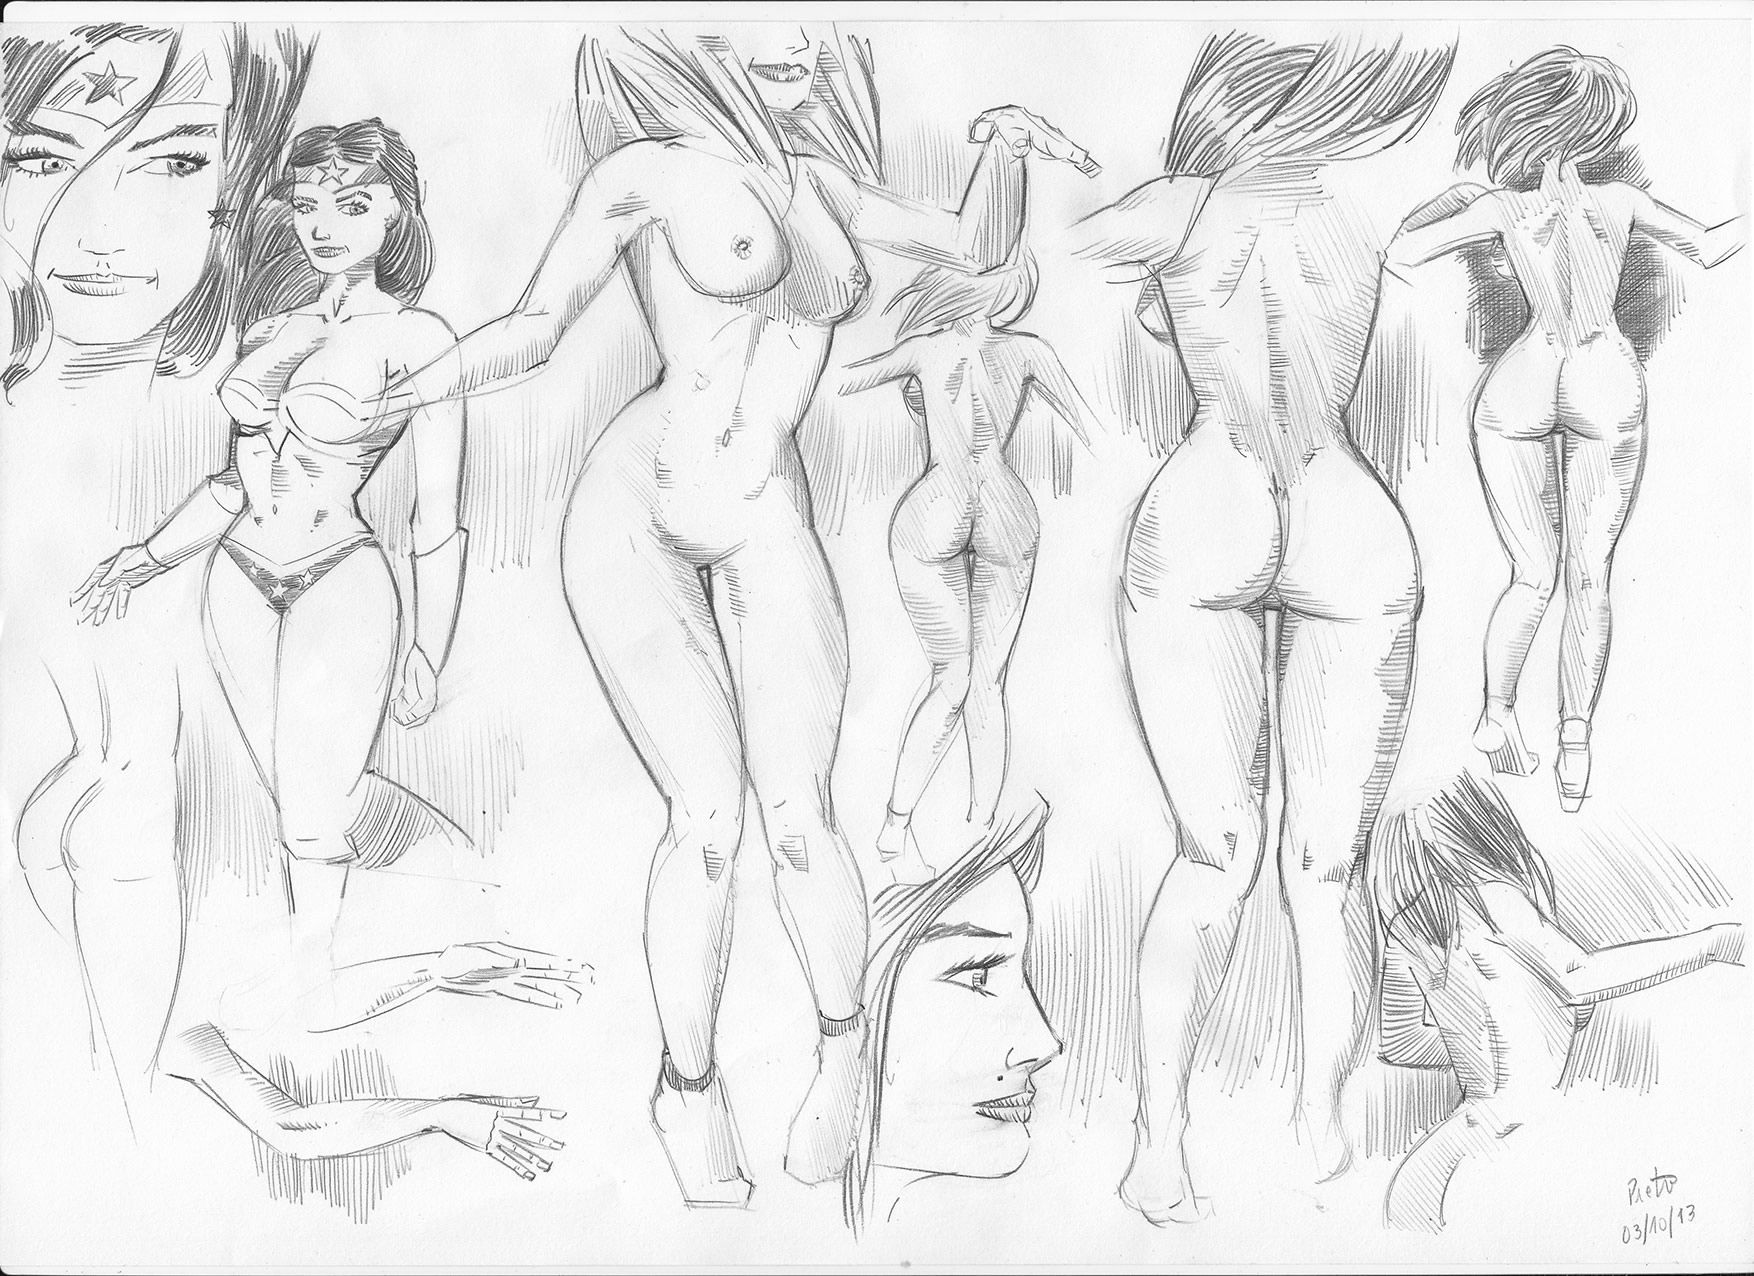 Estudos de anatomia feminina / Female anatomy studies ...